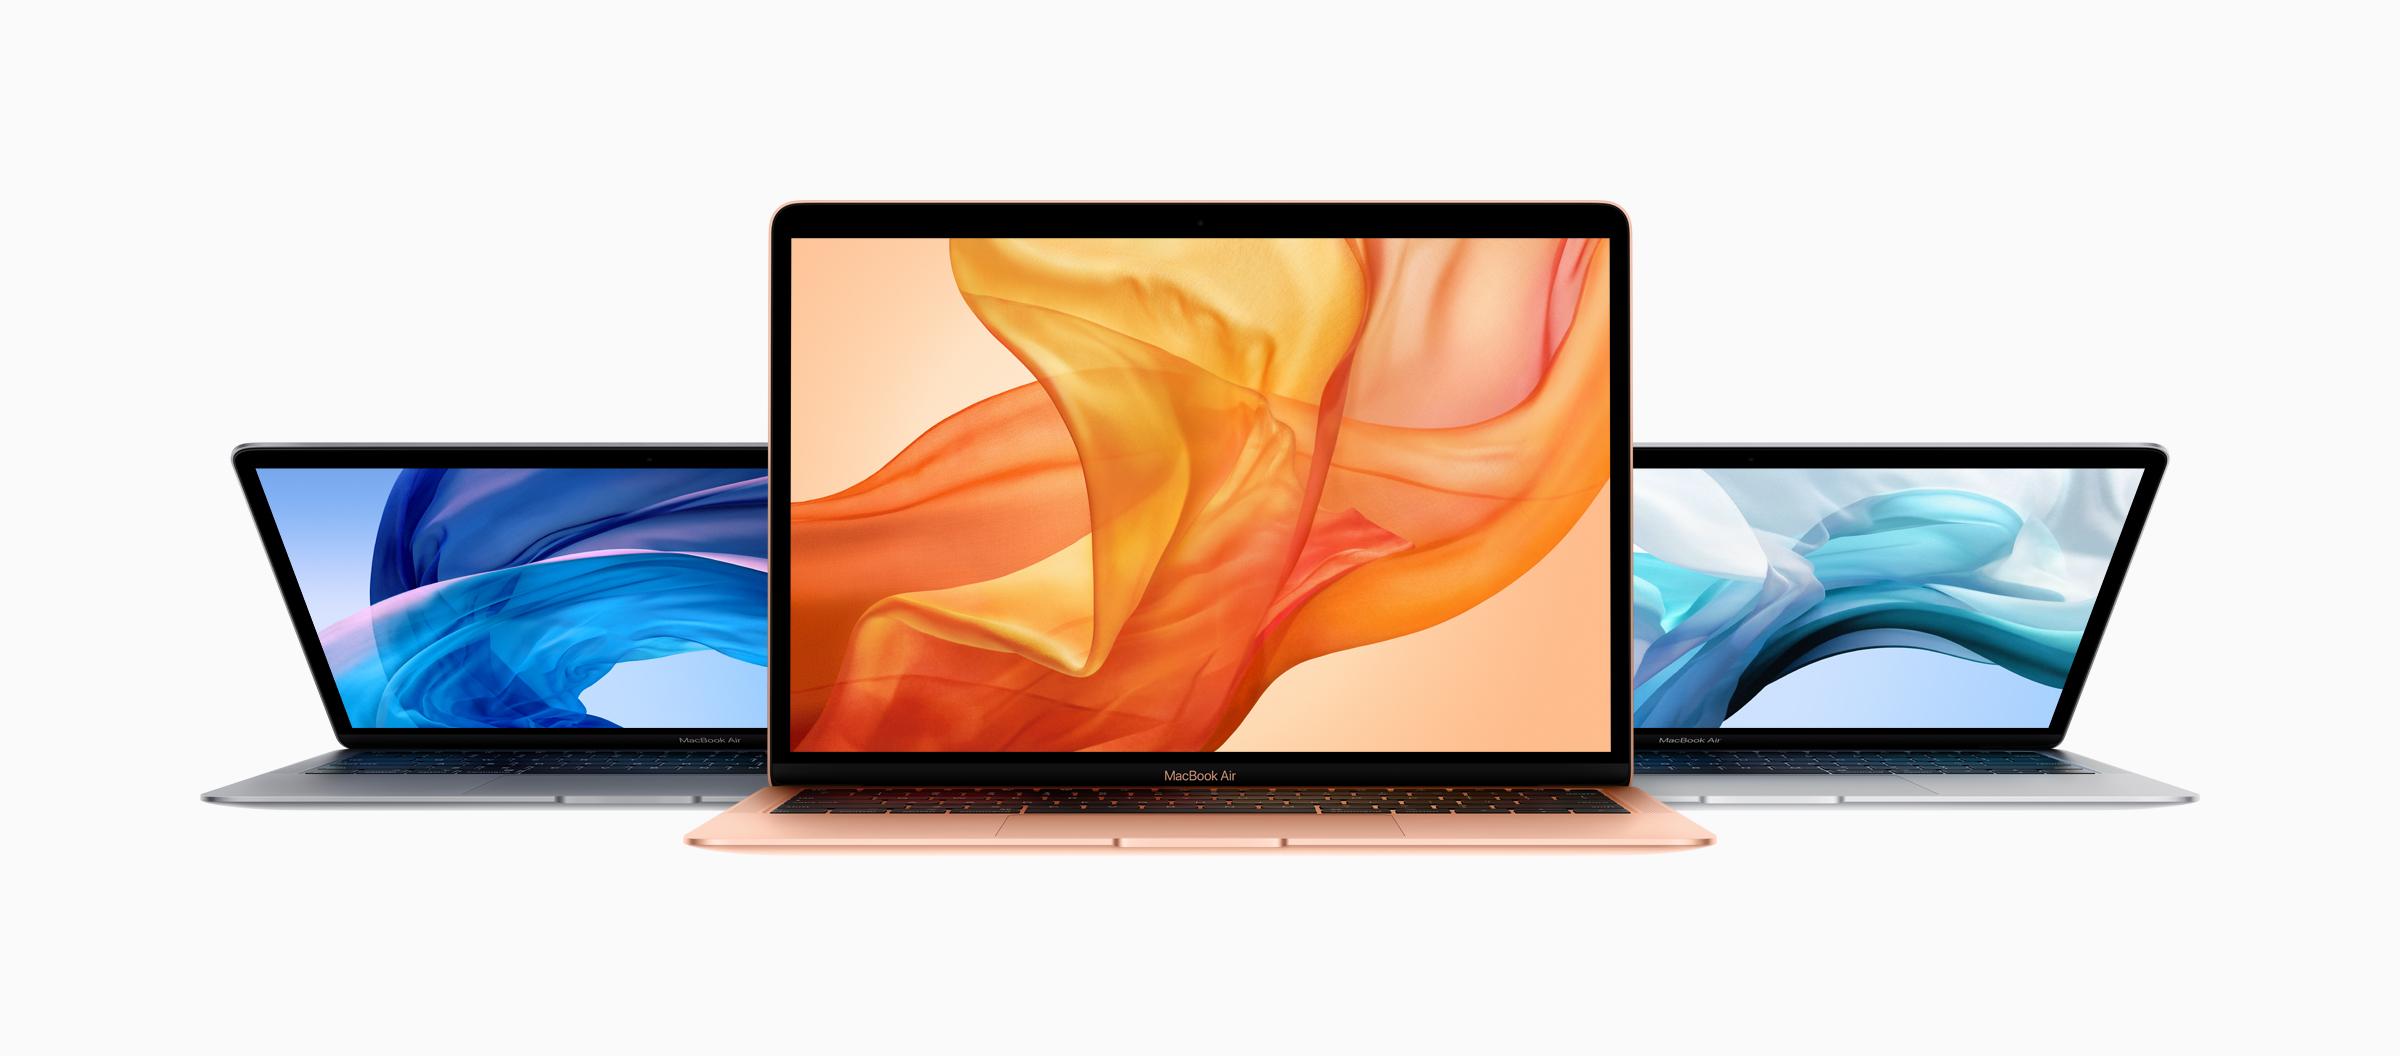 Apple Debuts New MacBook Air - Retina Display, Faster Processors, USB-C, T2 Chip, More